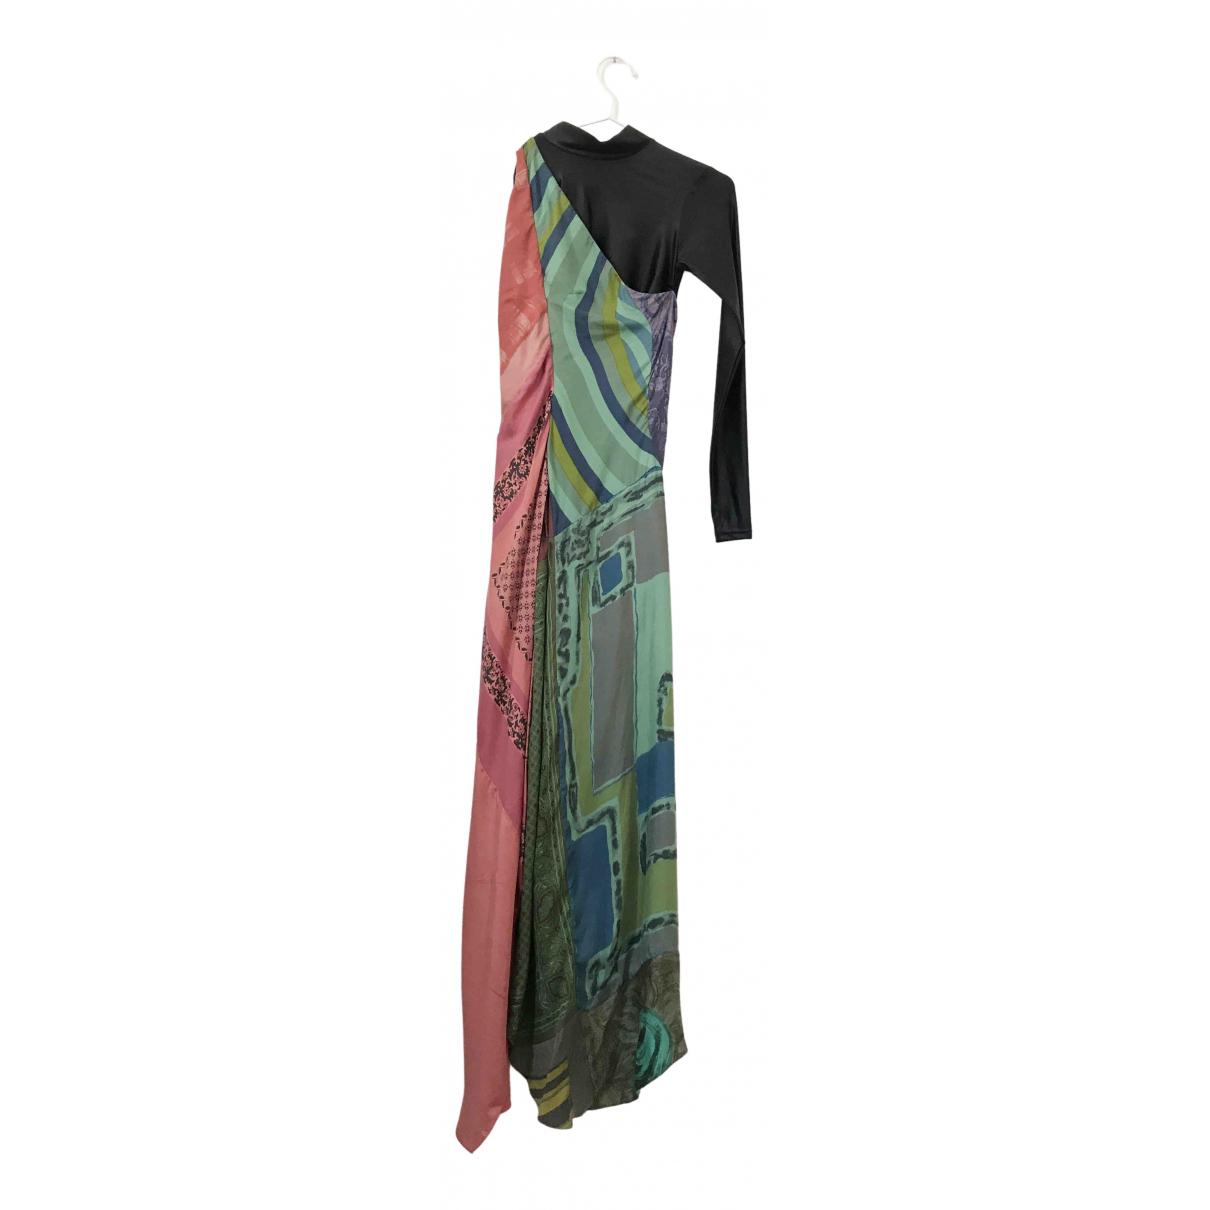 Marine Serre N Multicolour Silk dress for Women S International